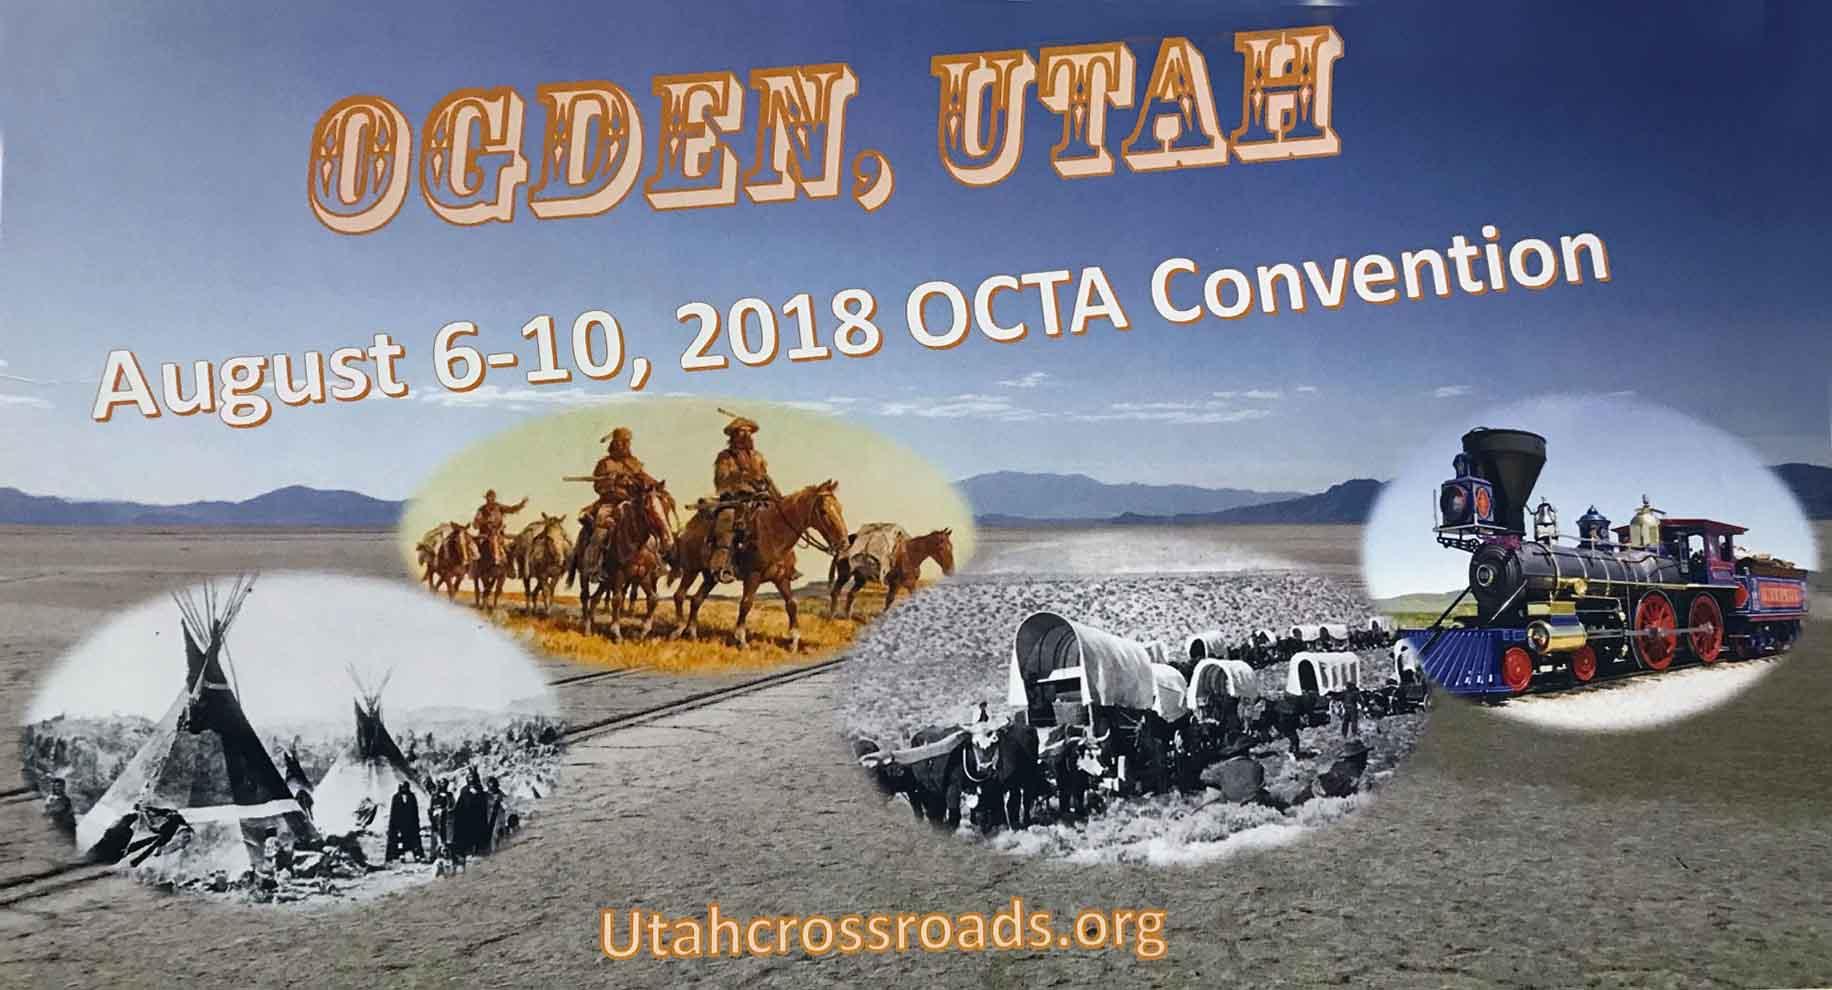 Ogden, Utah OCTA Convention 2018!